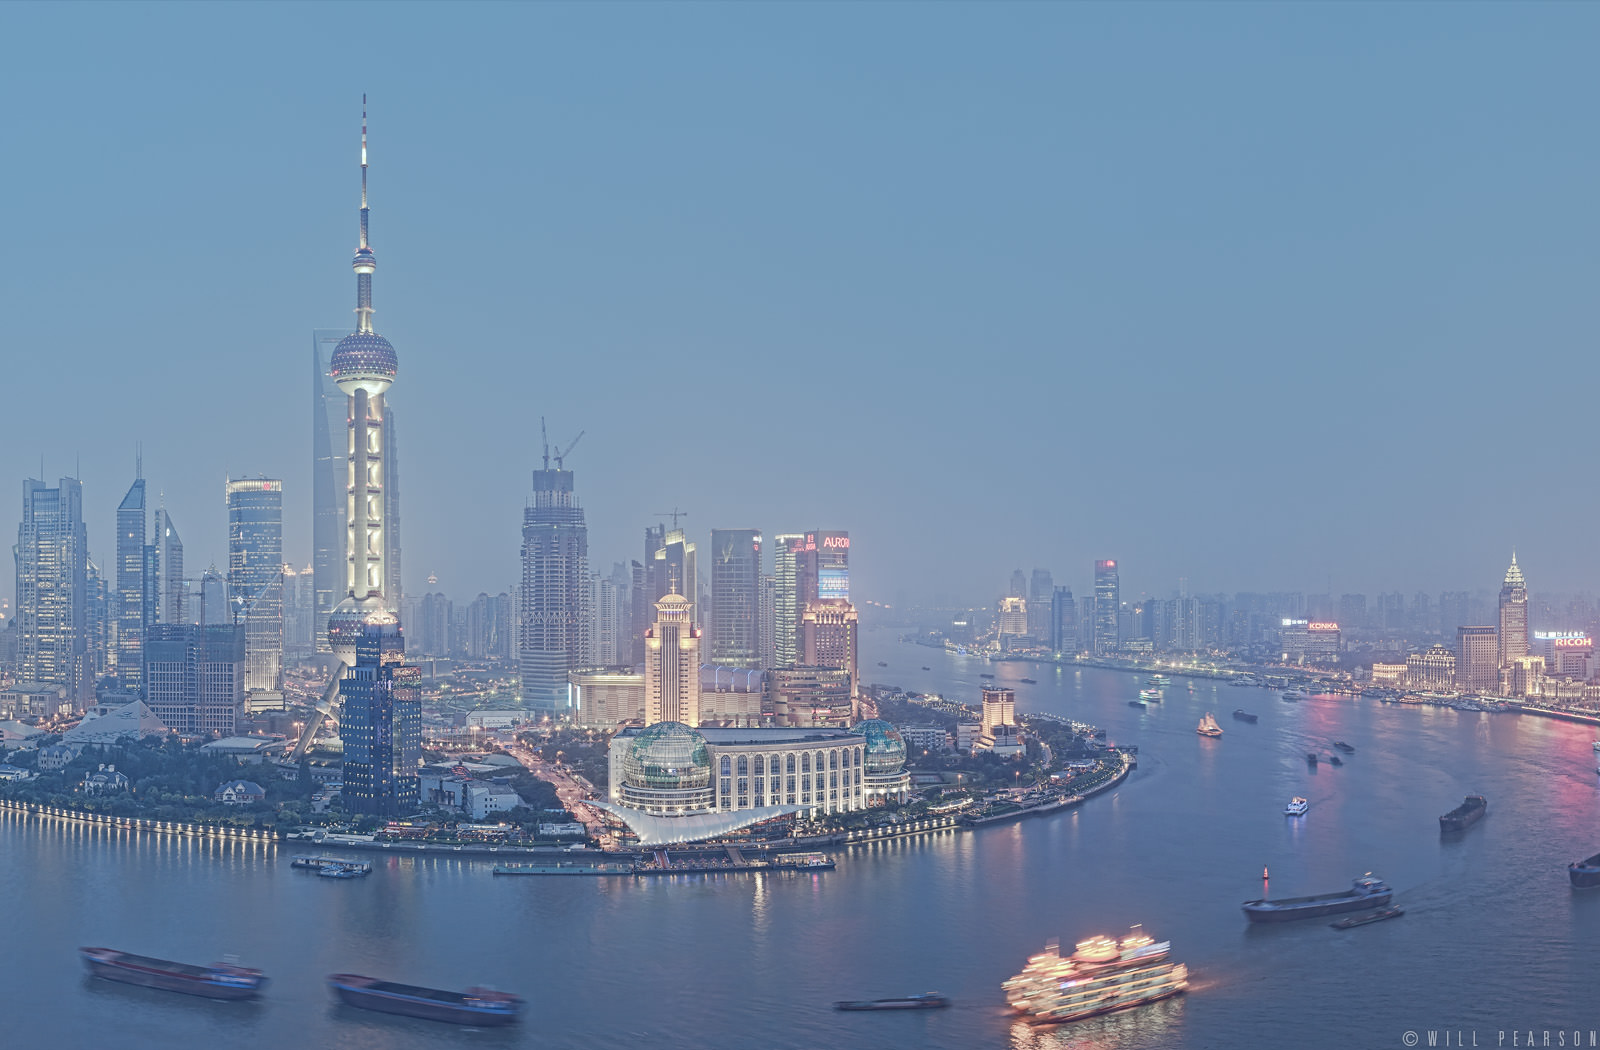 Blue Hour over the Huangpu River, Shanghai